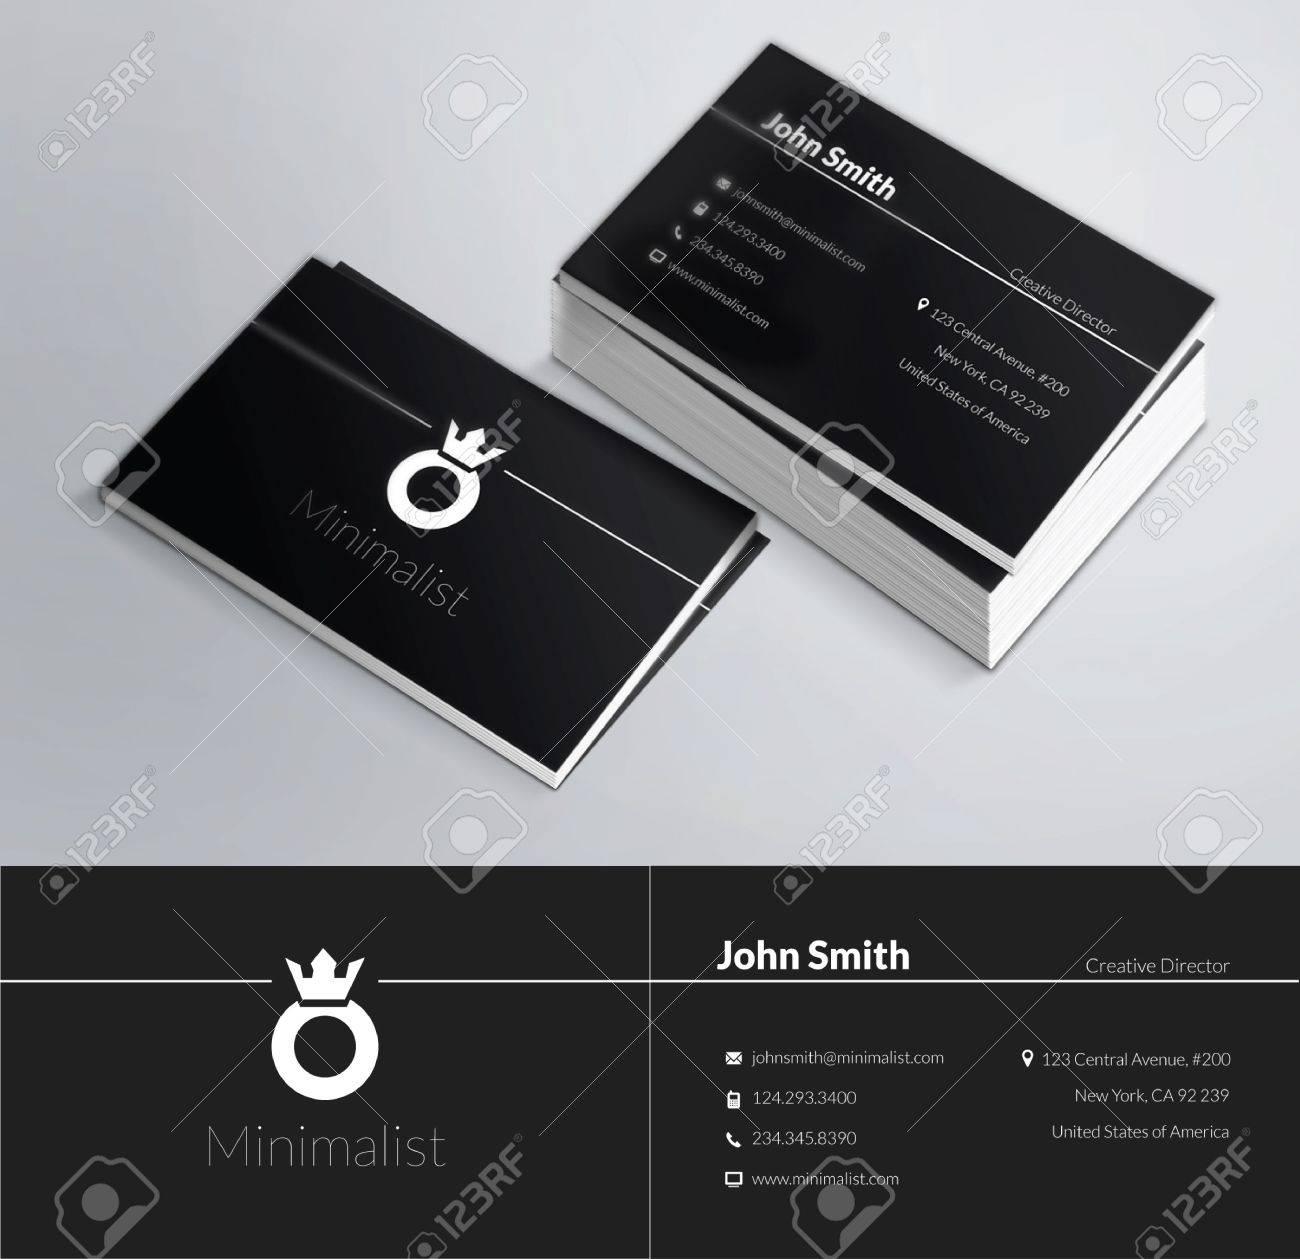 business card printing milwaukee gallery free business cards magic business cards images free business cards 239